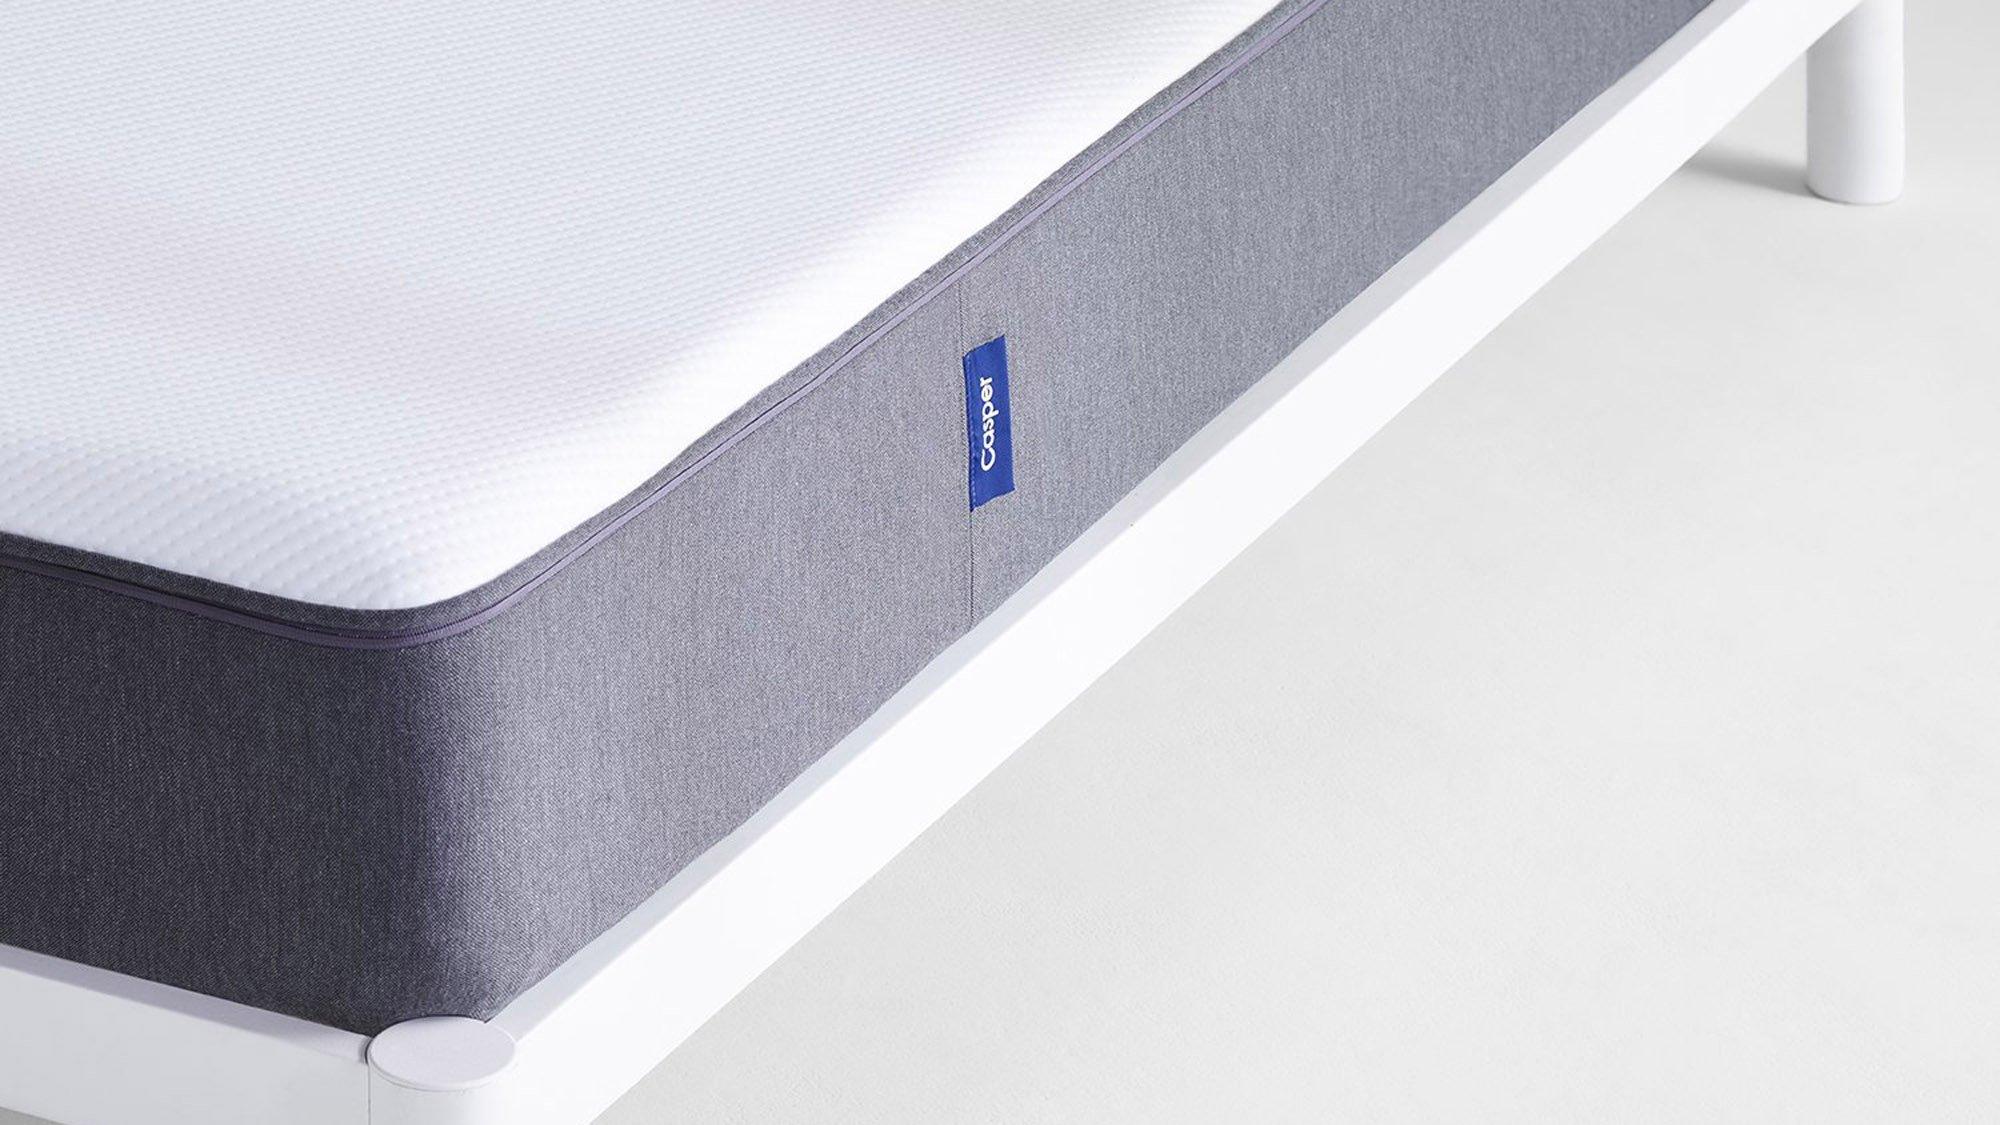 Casper Mattress Review The Original Bed In A Box Expert